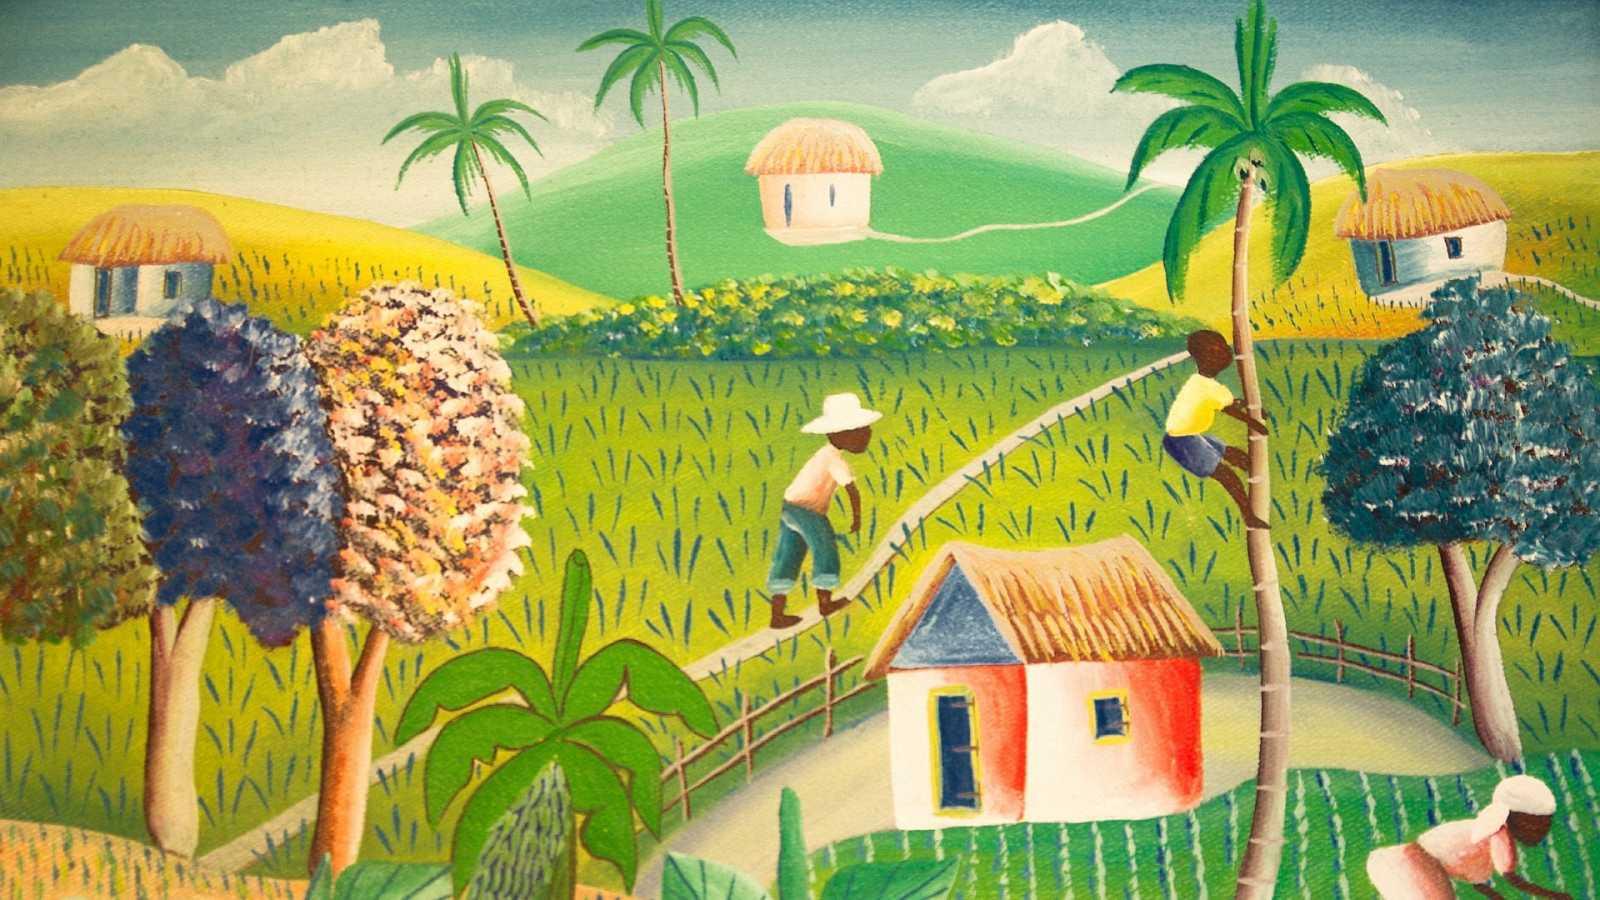 Tapiz sonoro - AmericÁfrica II: Haití - 12/07/20 - escuchar ahora